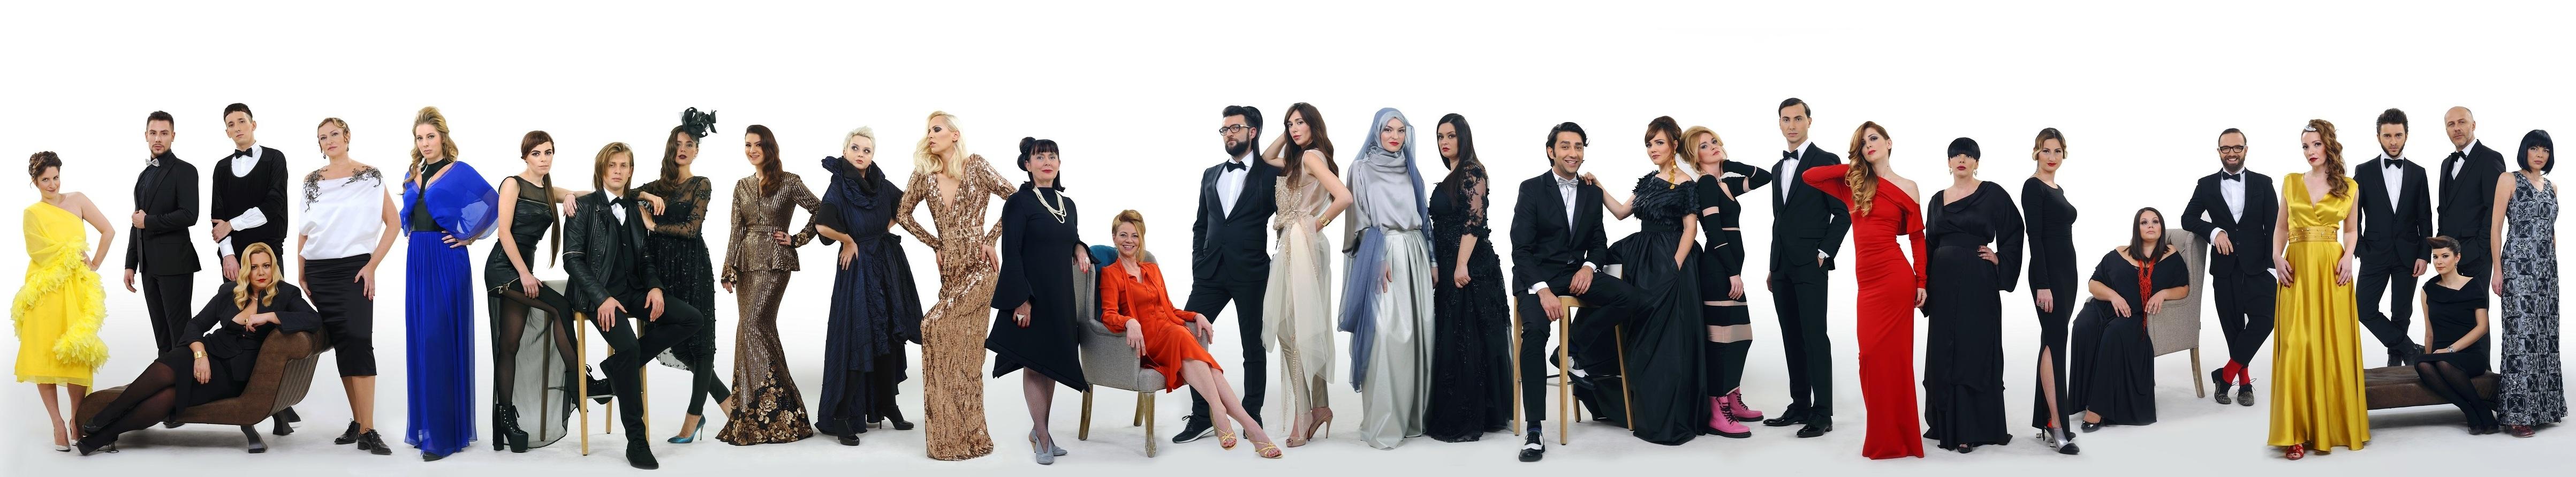 Fashion,Beauty & Love editorijal